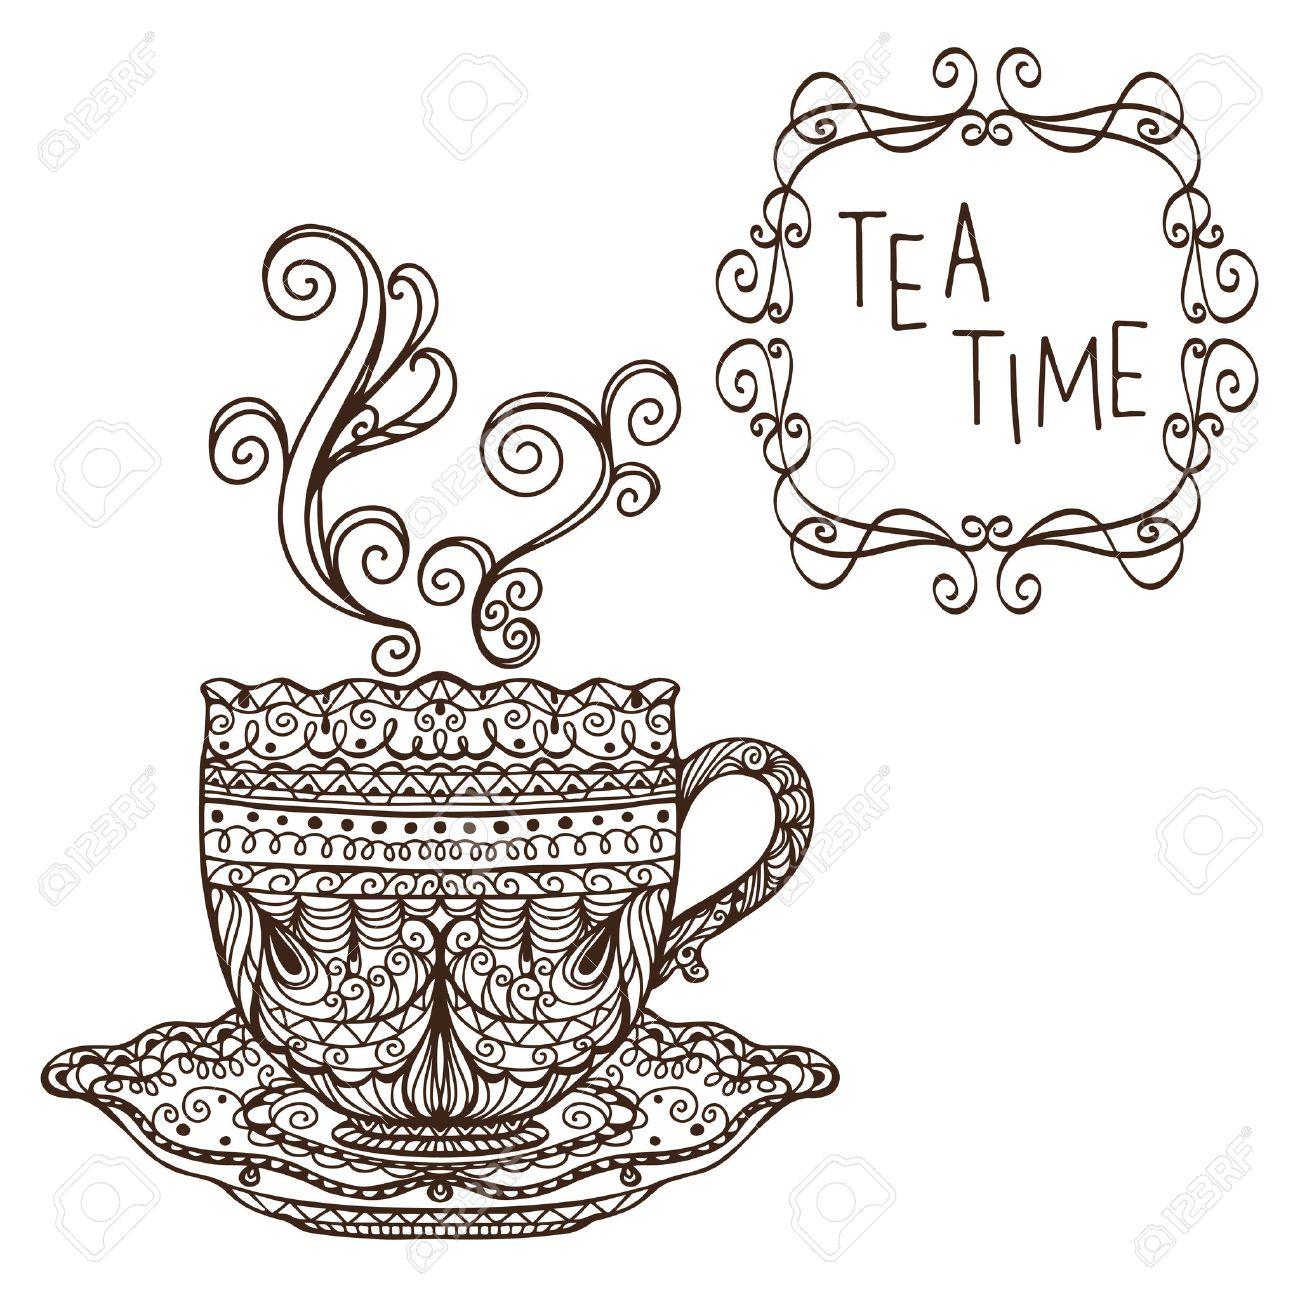 Elegant tea party invitation template with teacups cartoon vector - Tea Party Vintage Background Vector Stock Vector 22567551